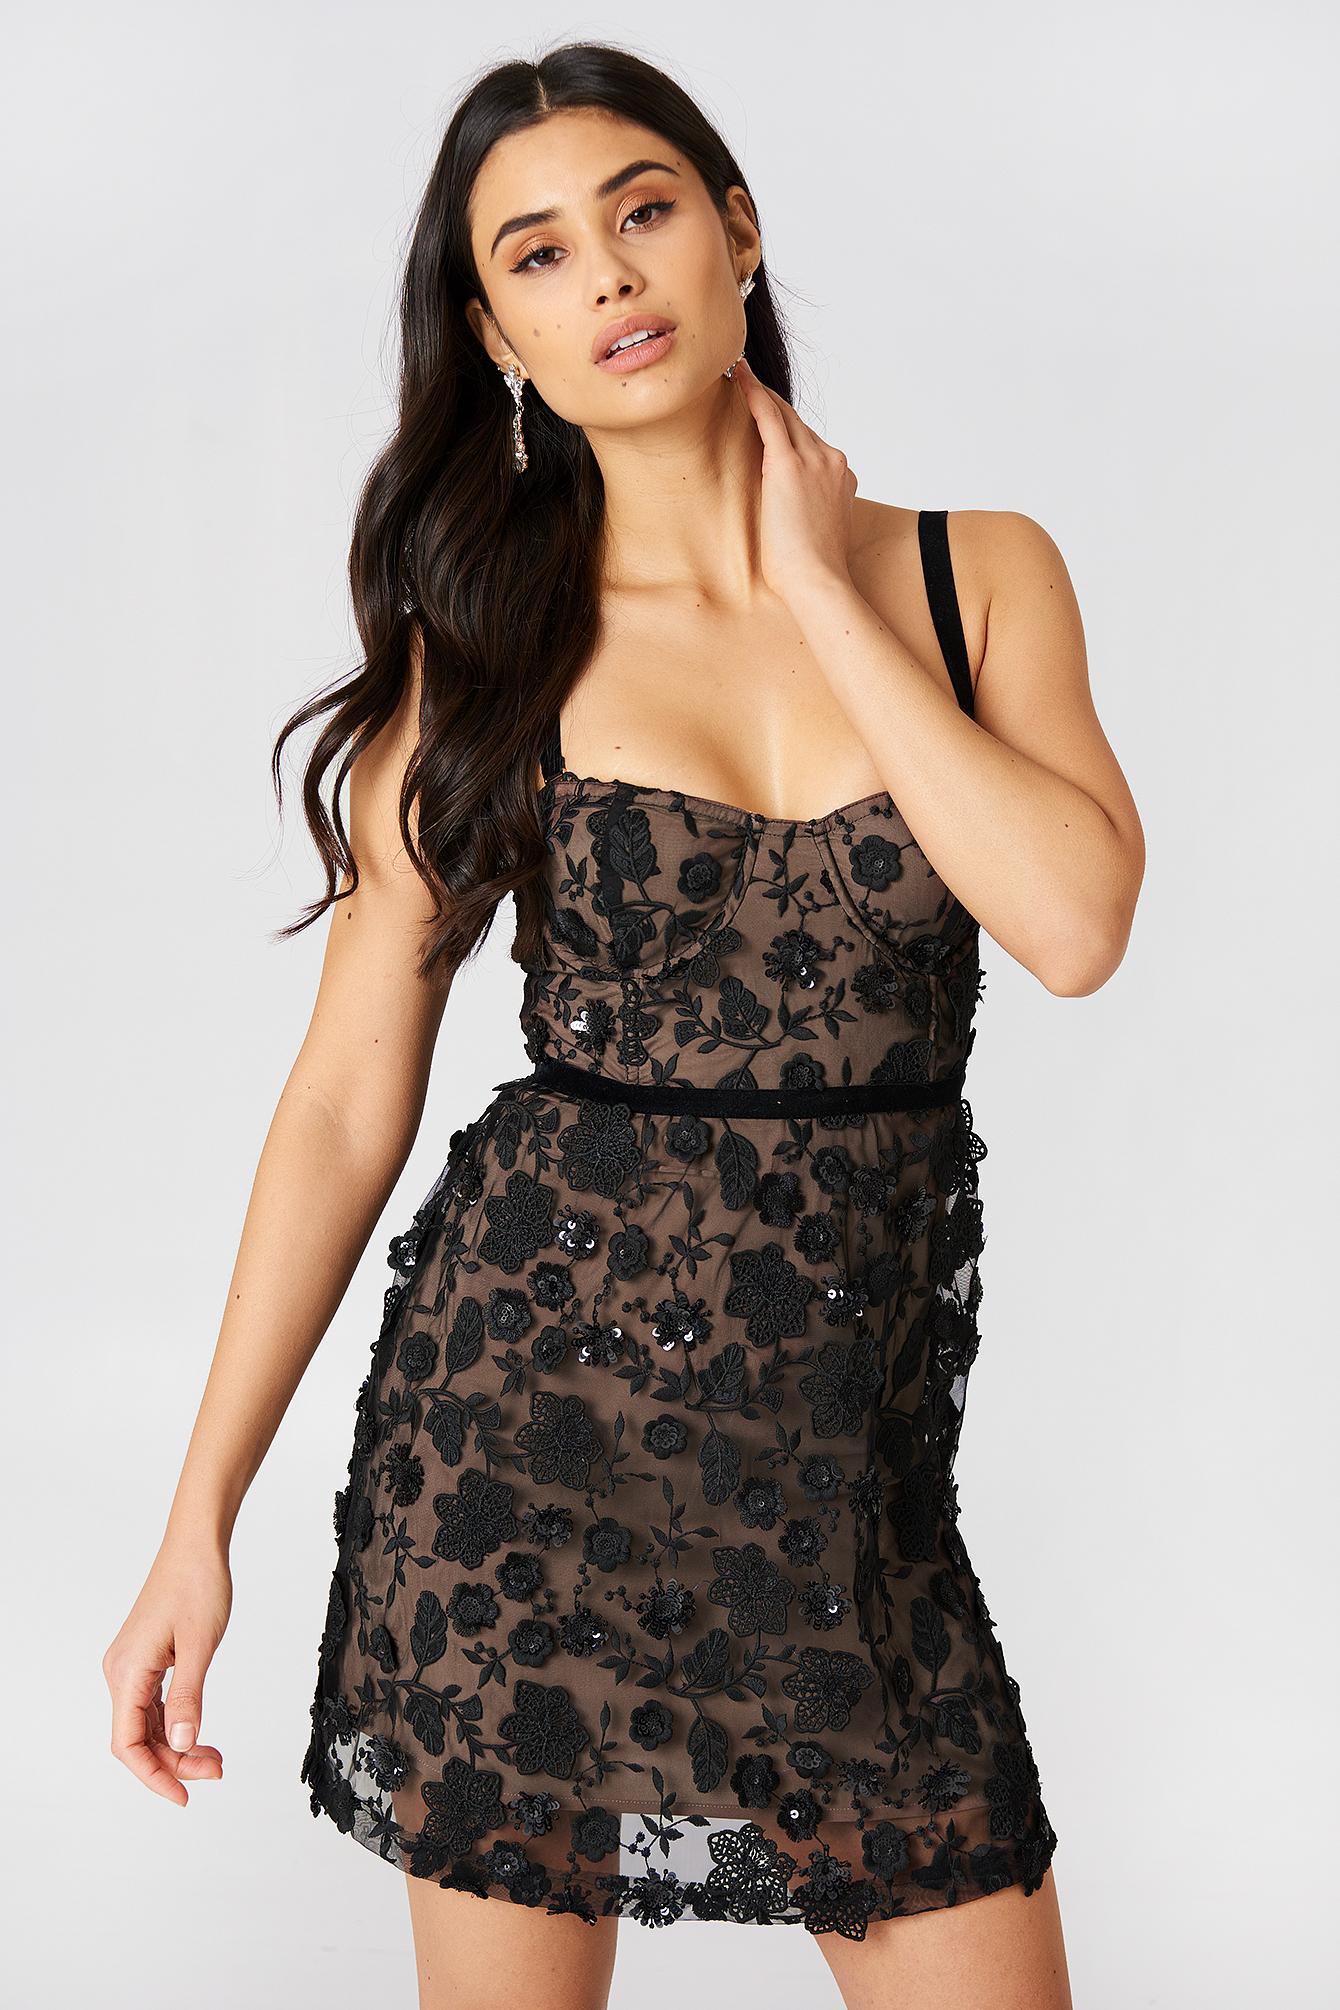 for love & lemons -  Beatrice Strappy Mini Dress - Black